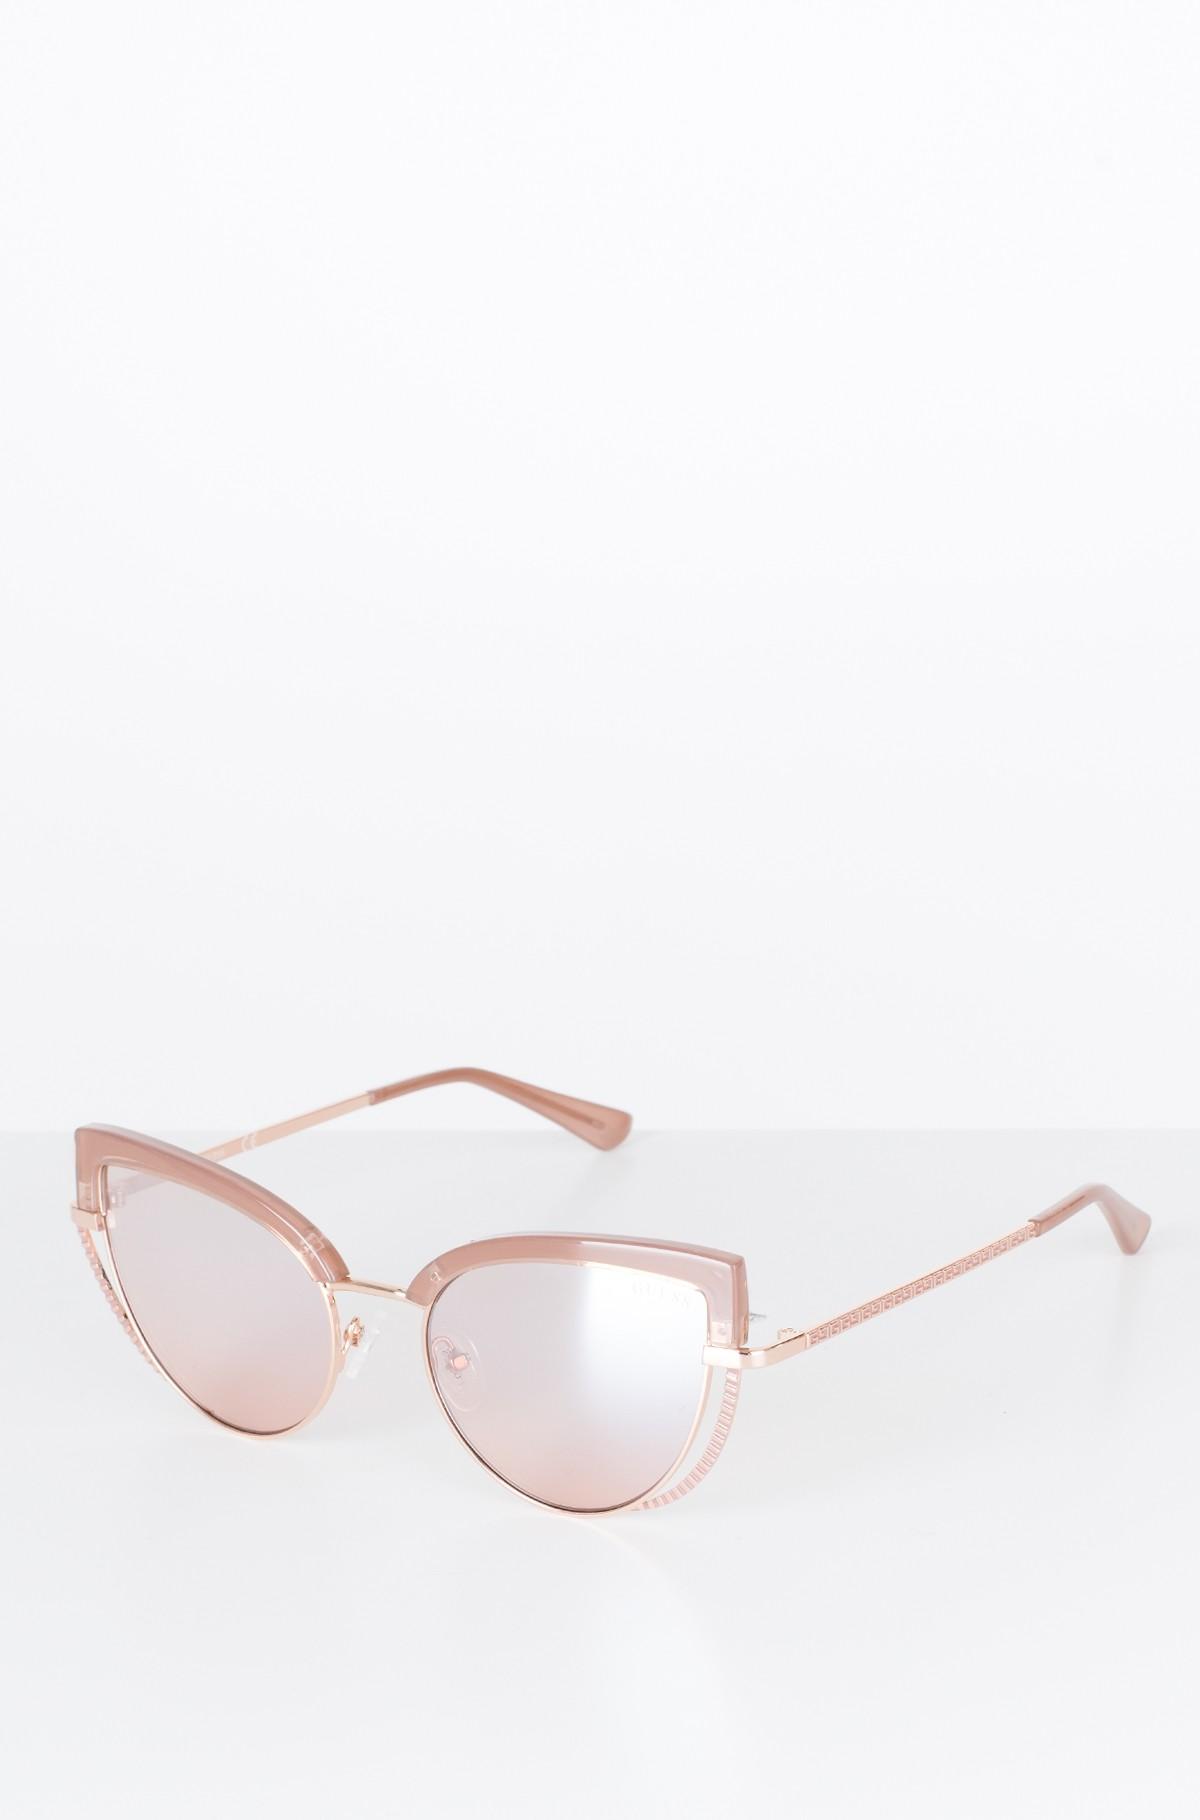 Saulesbrilles 7622-full-1